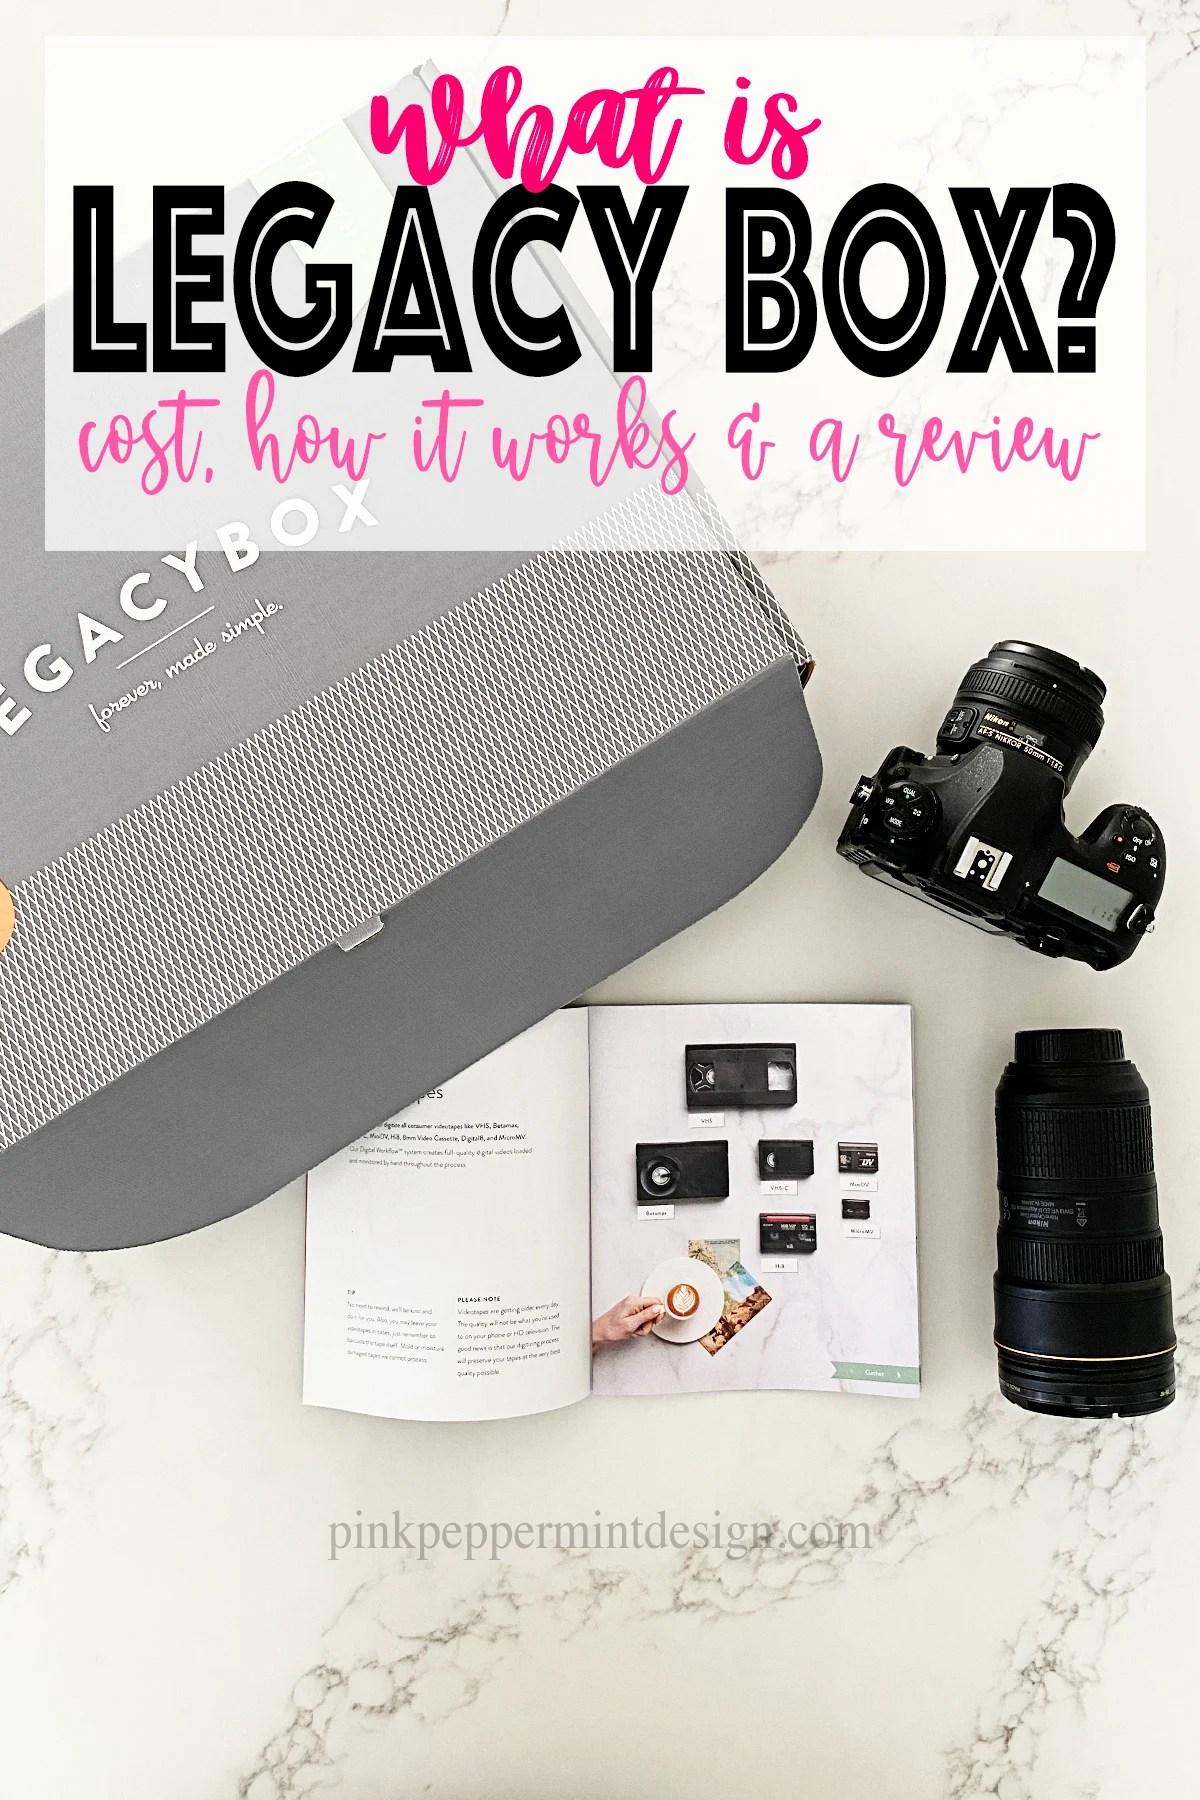 Legacy box 12